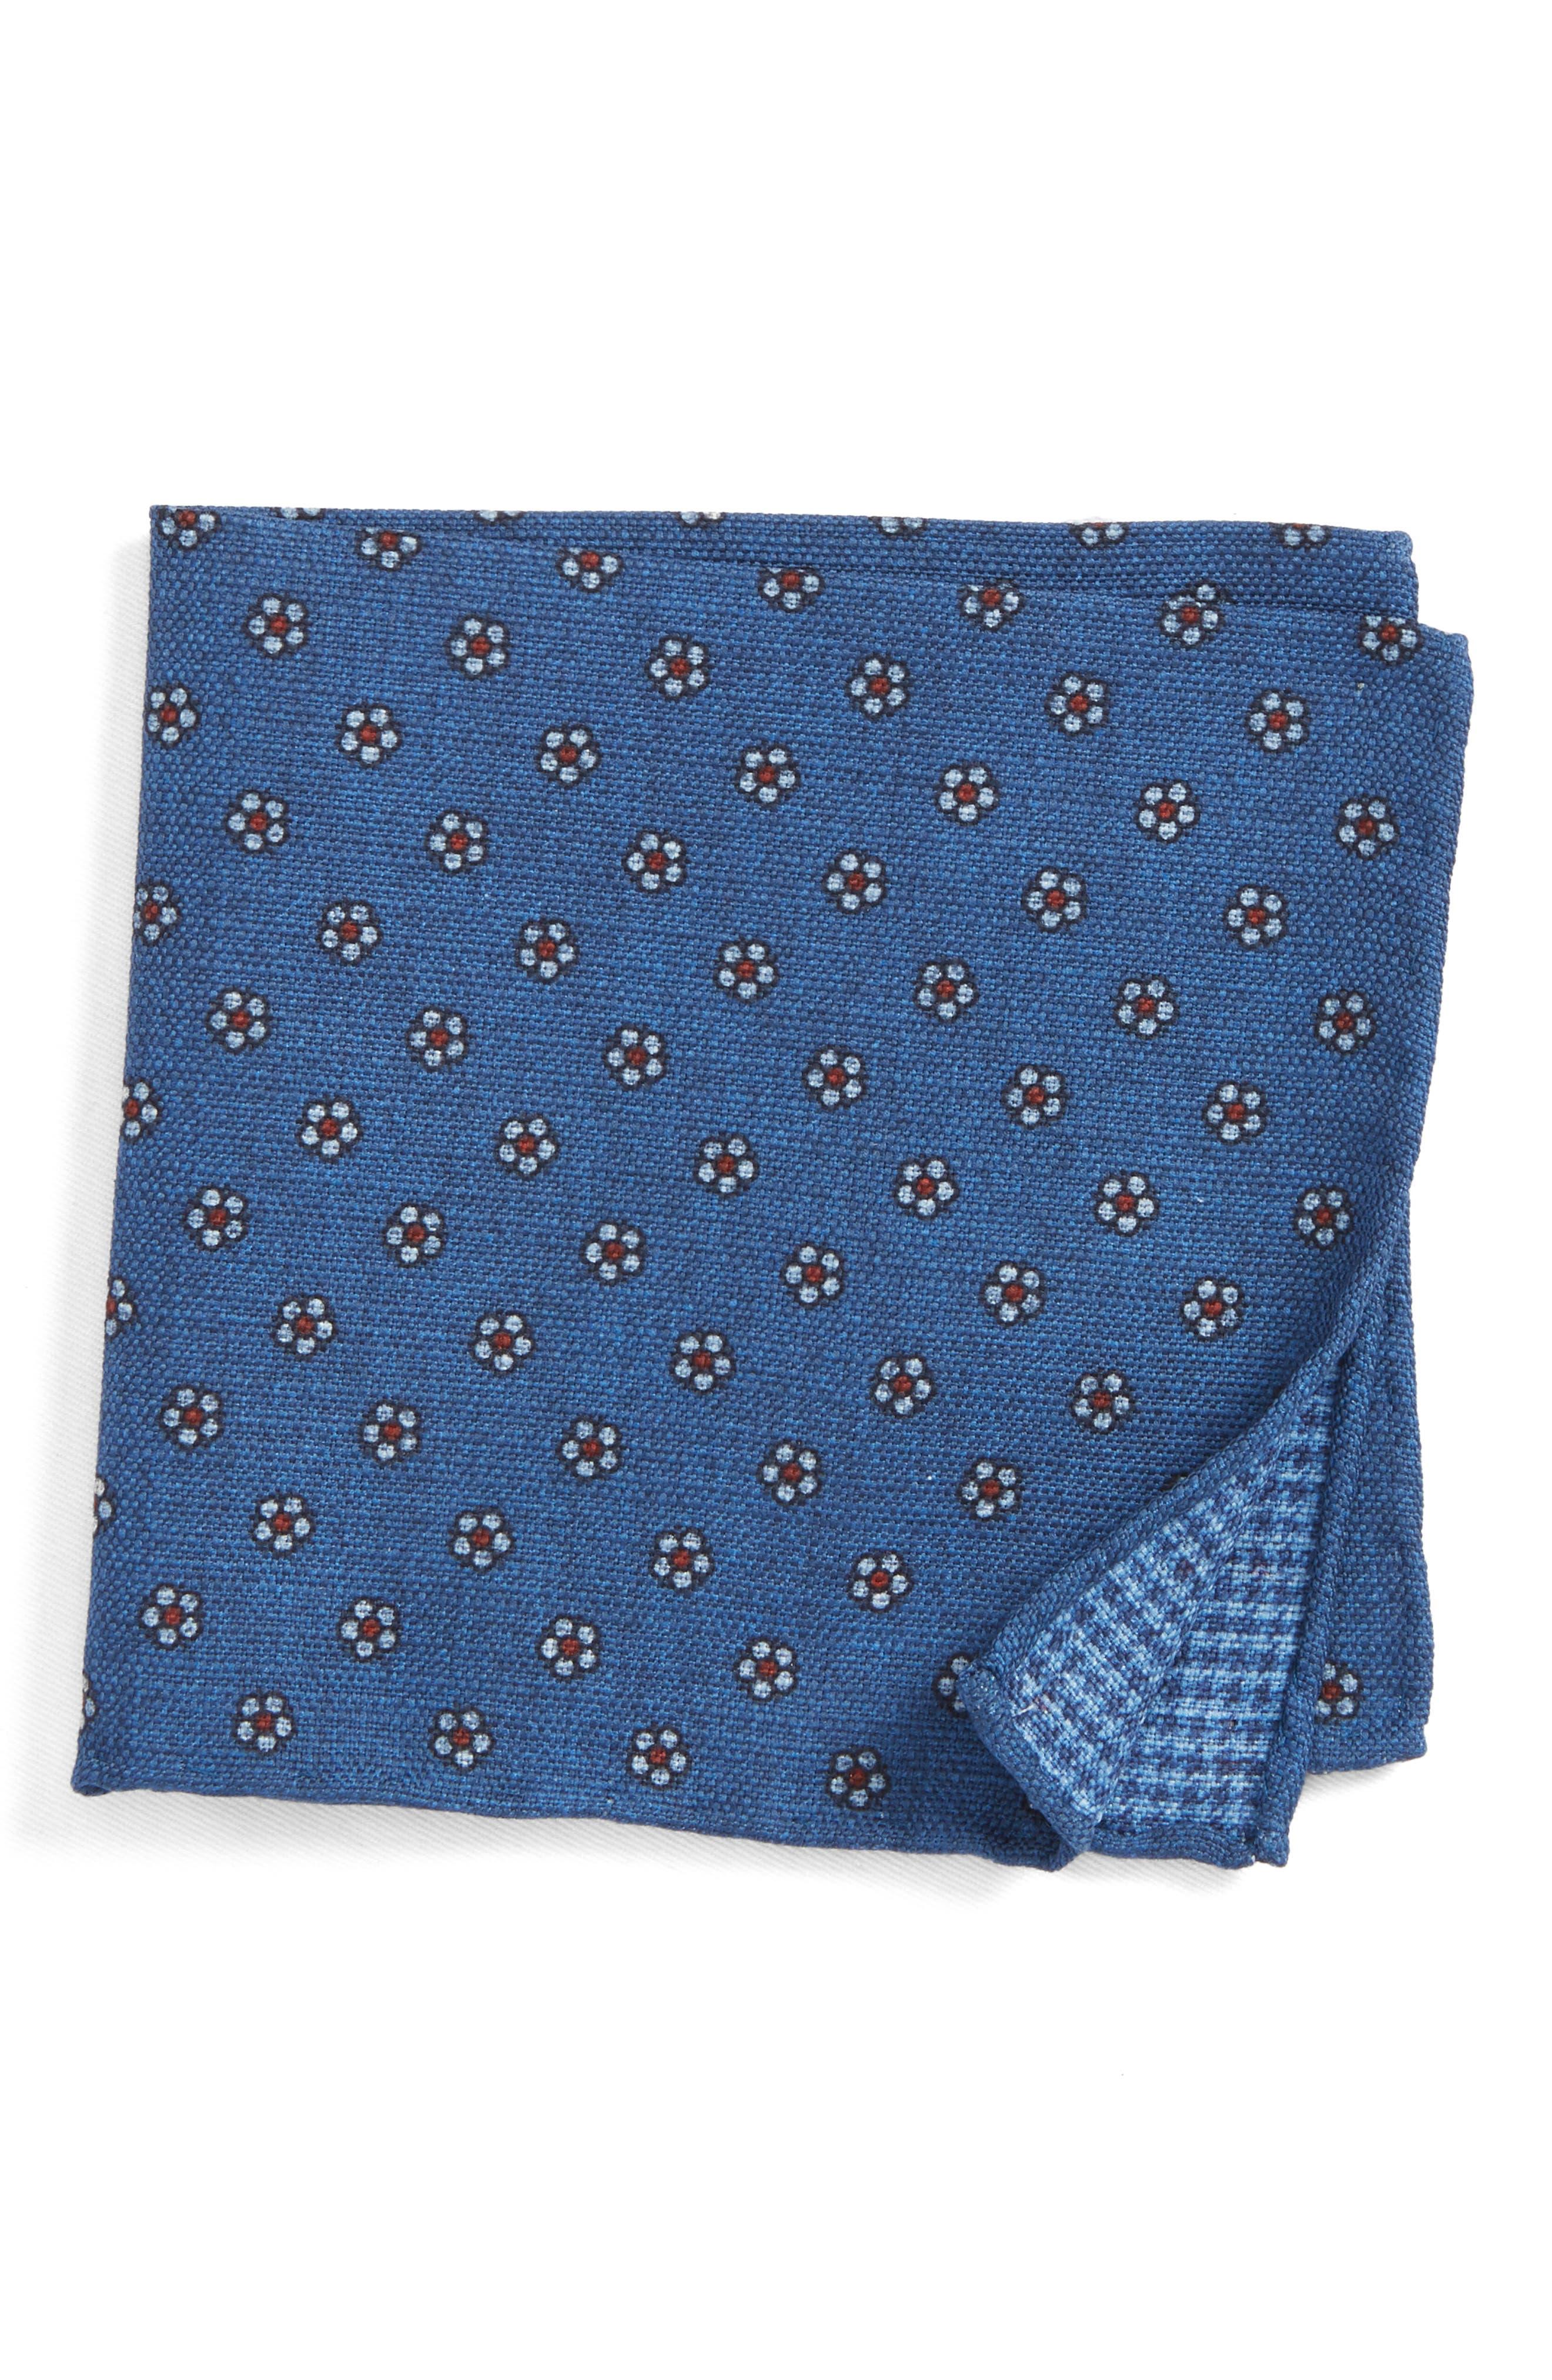 Floral Medallion Pocket Square,                             Main thumbnail 1, color,                             Blue